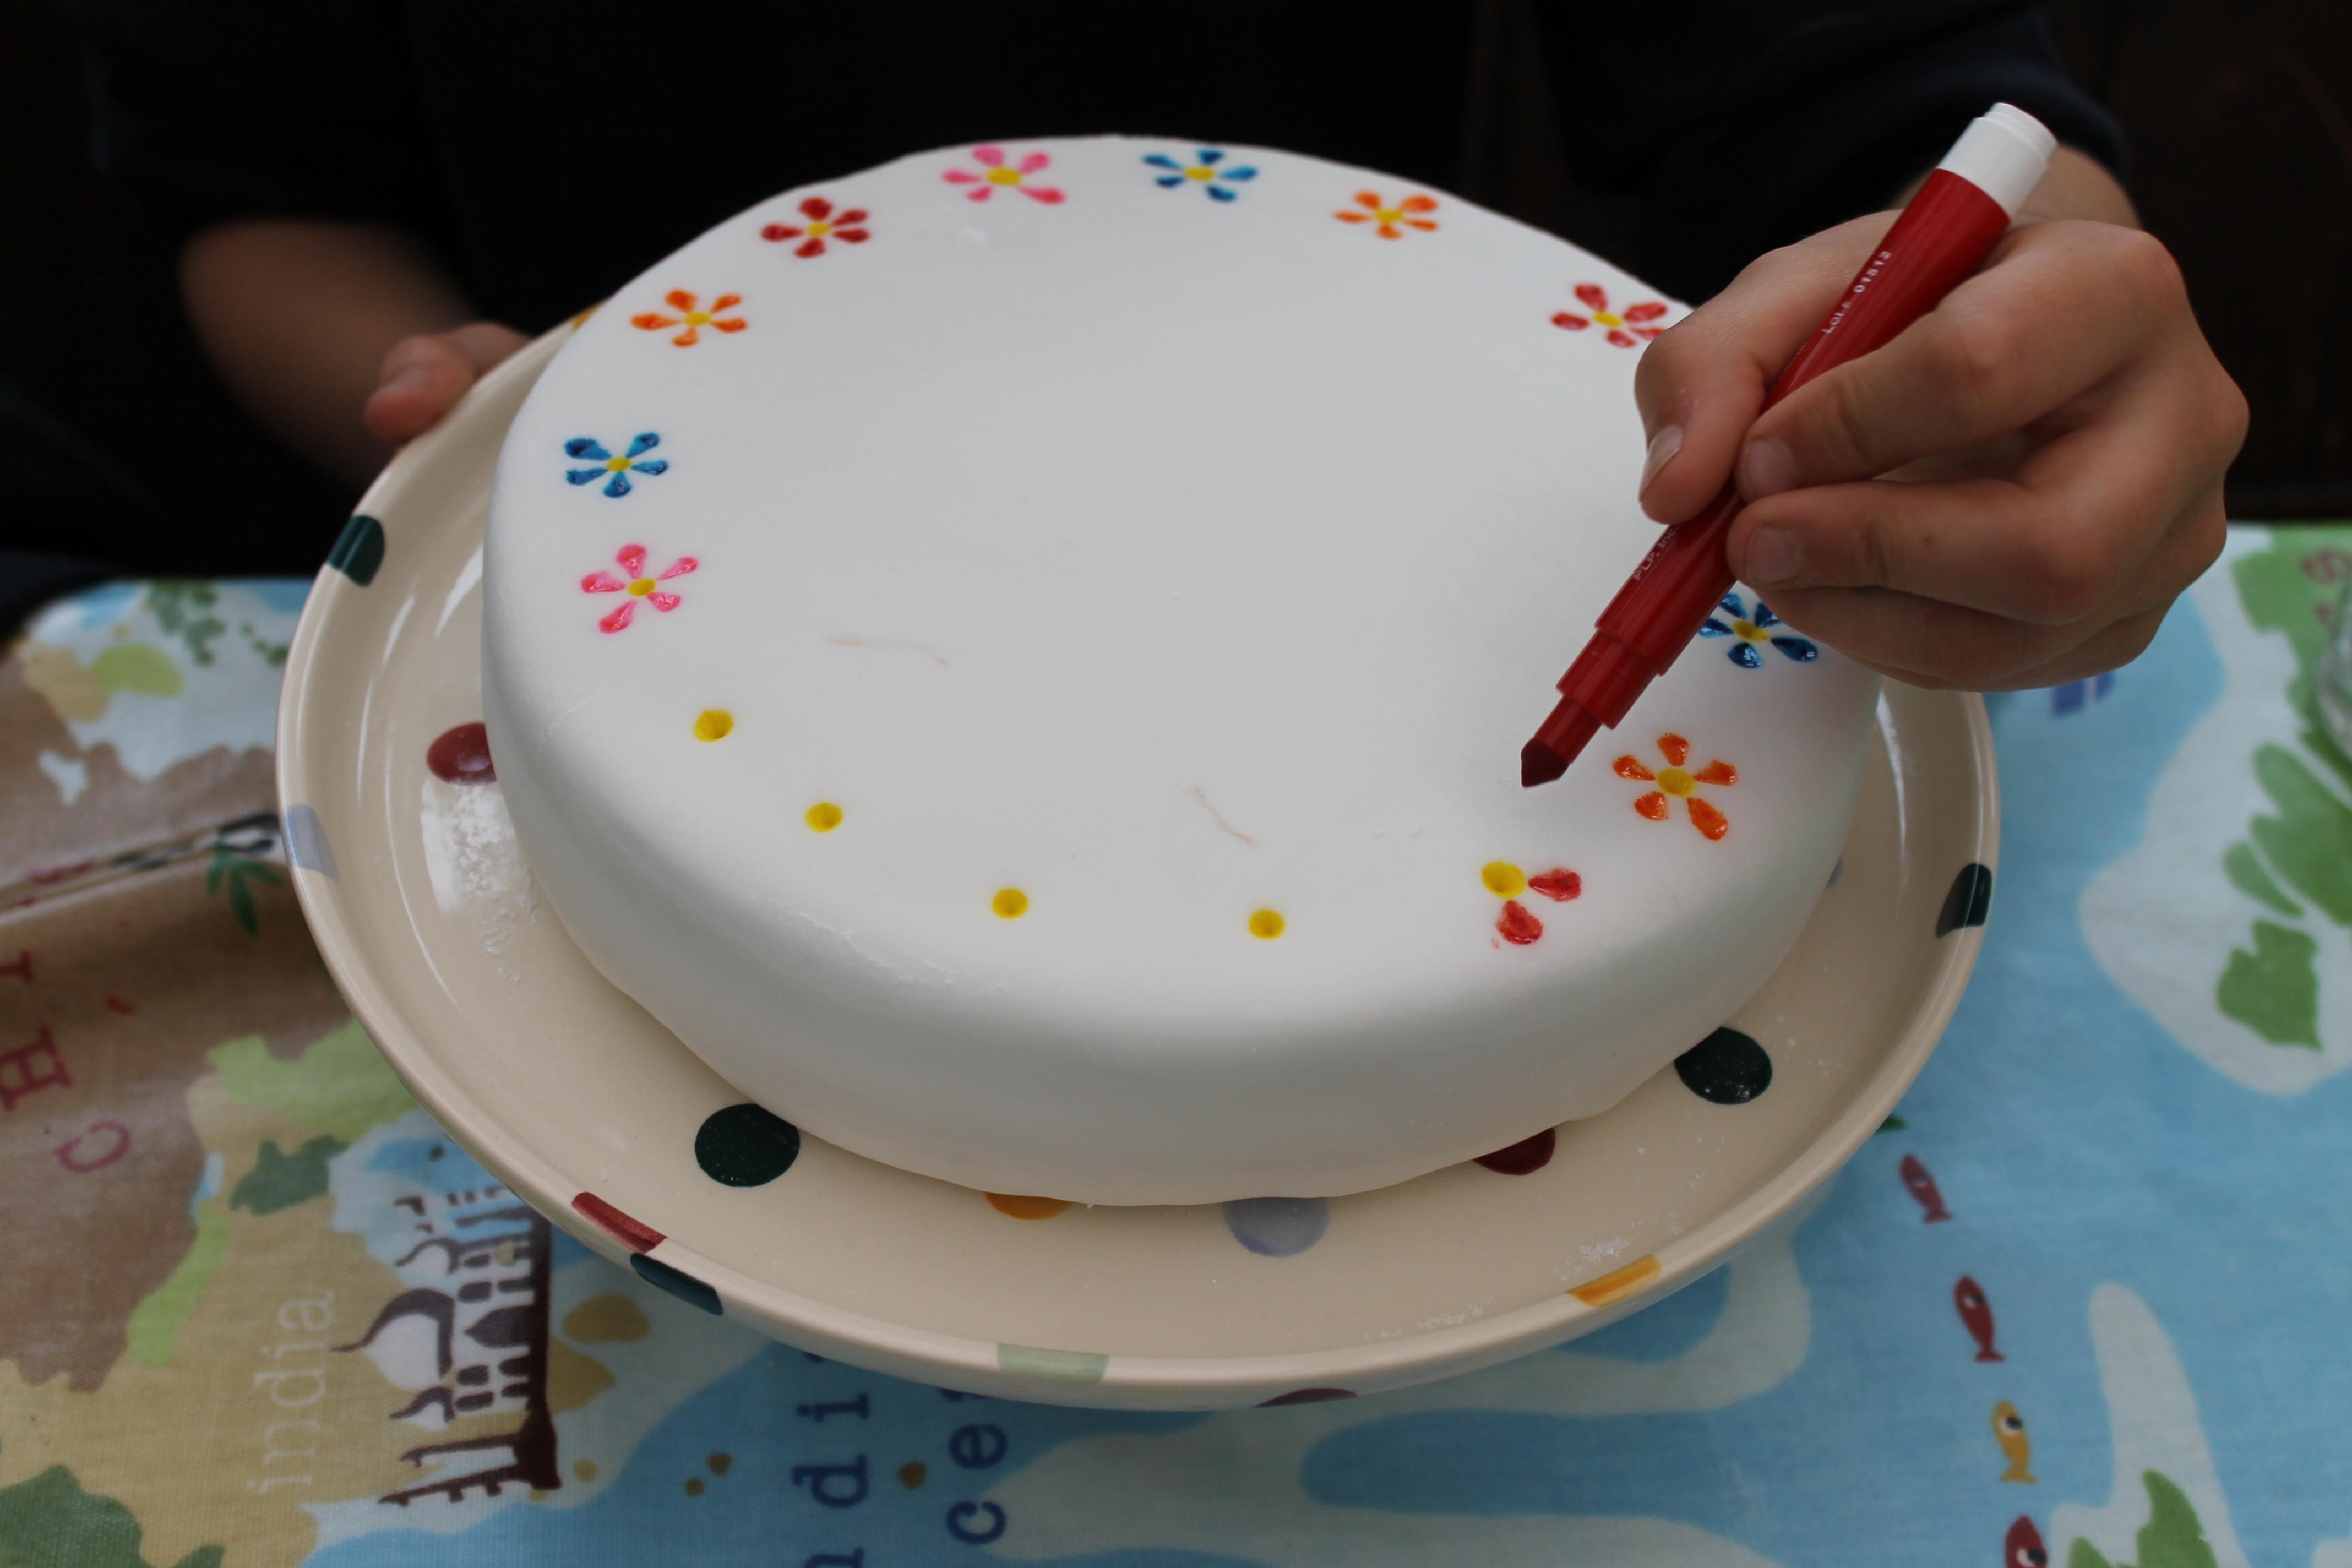 Imgenes De Childrens Cake Decorations Ideas